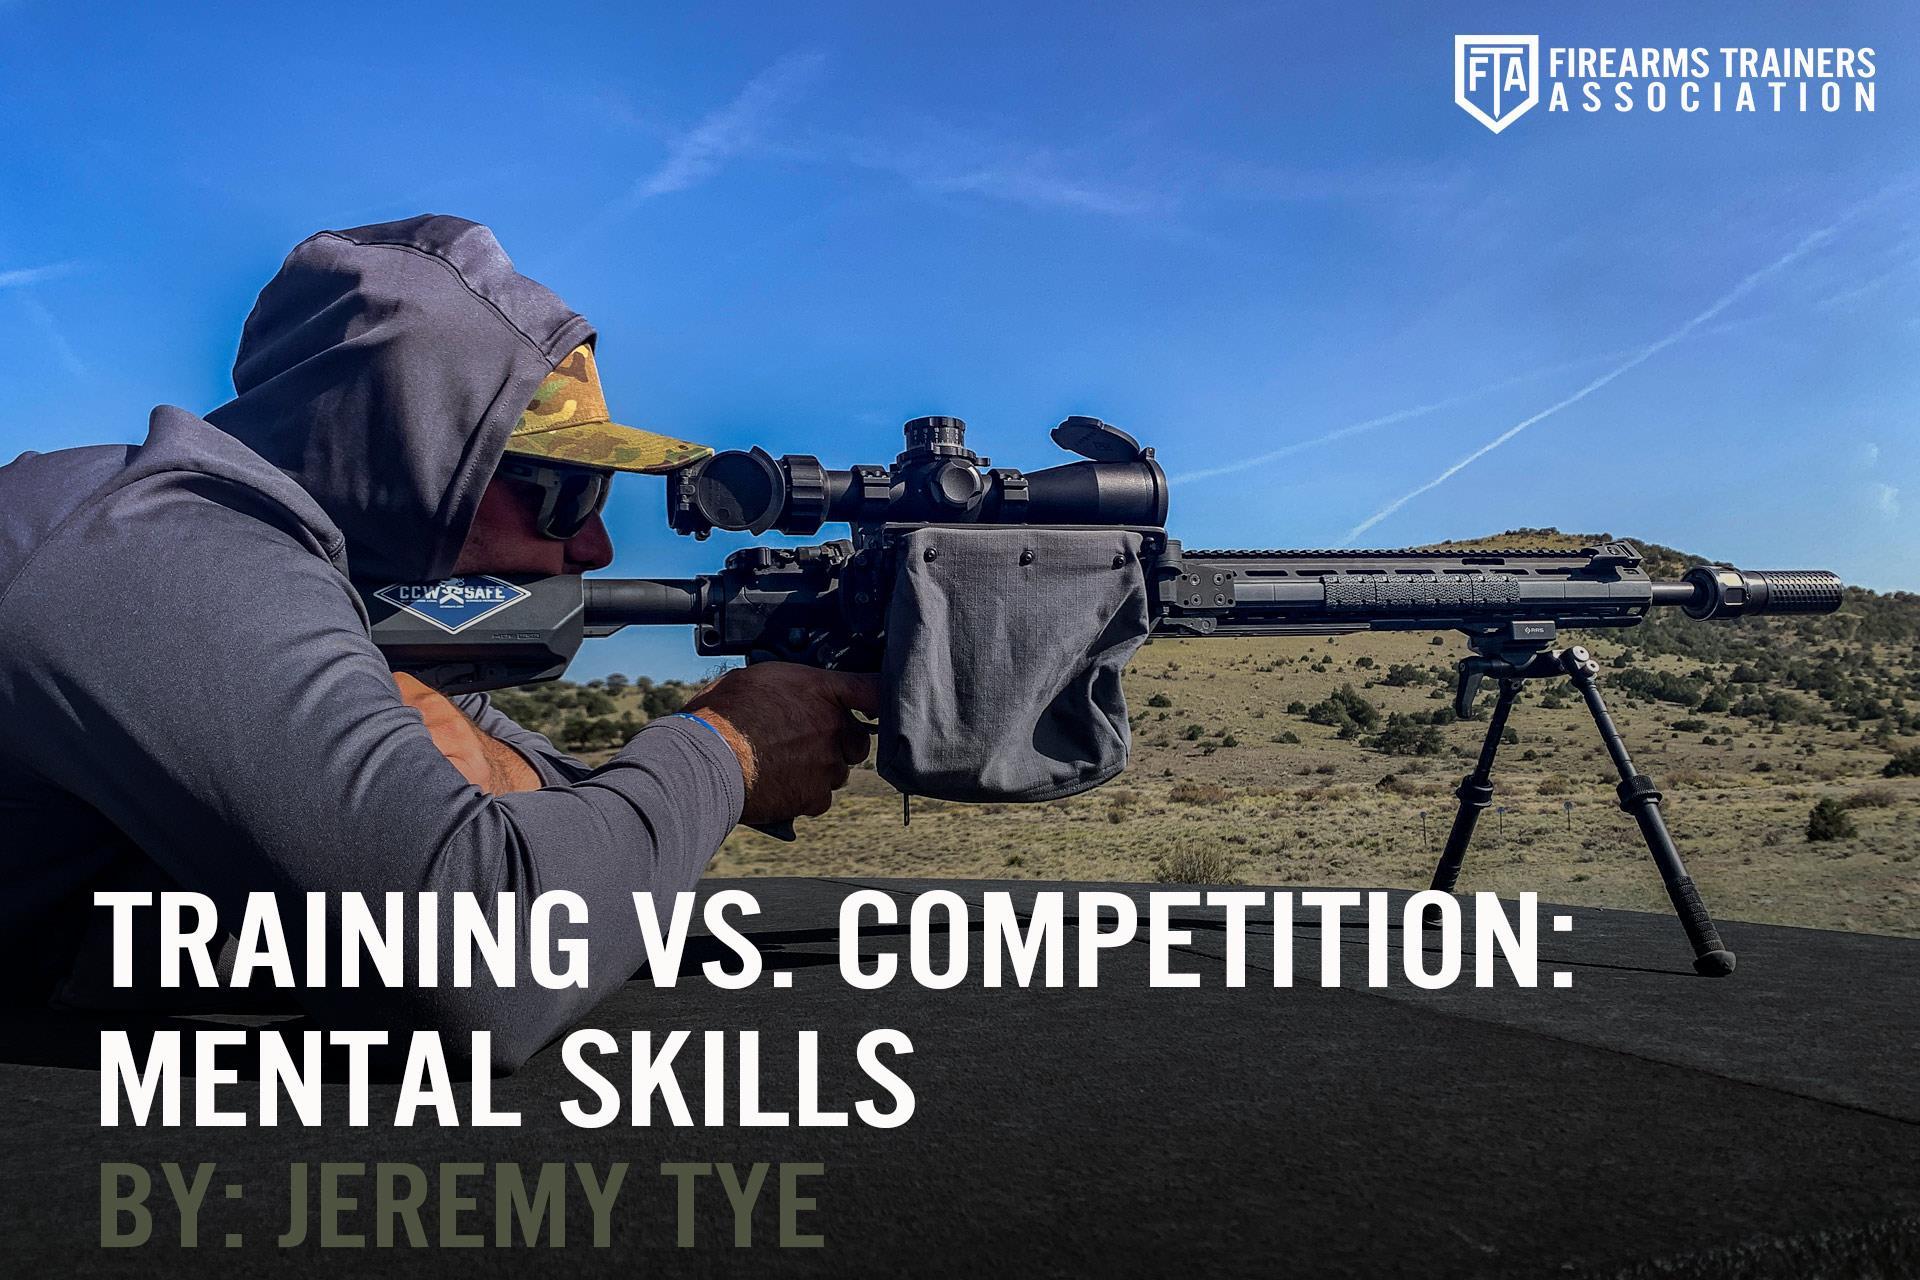 Training Vs. Competition: Mental Skills